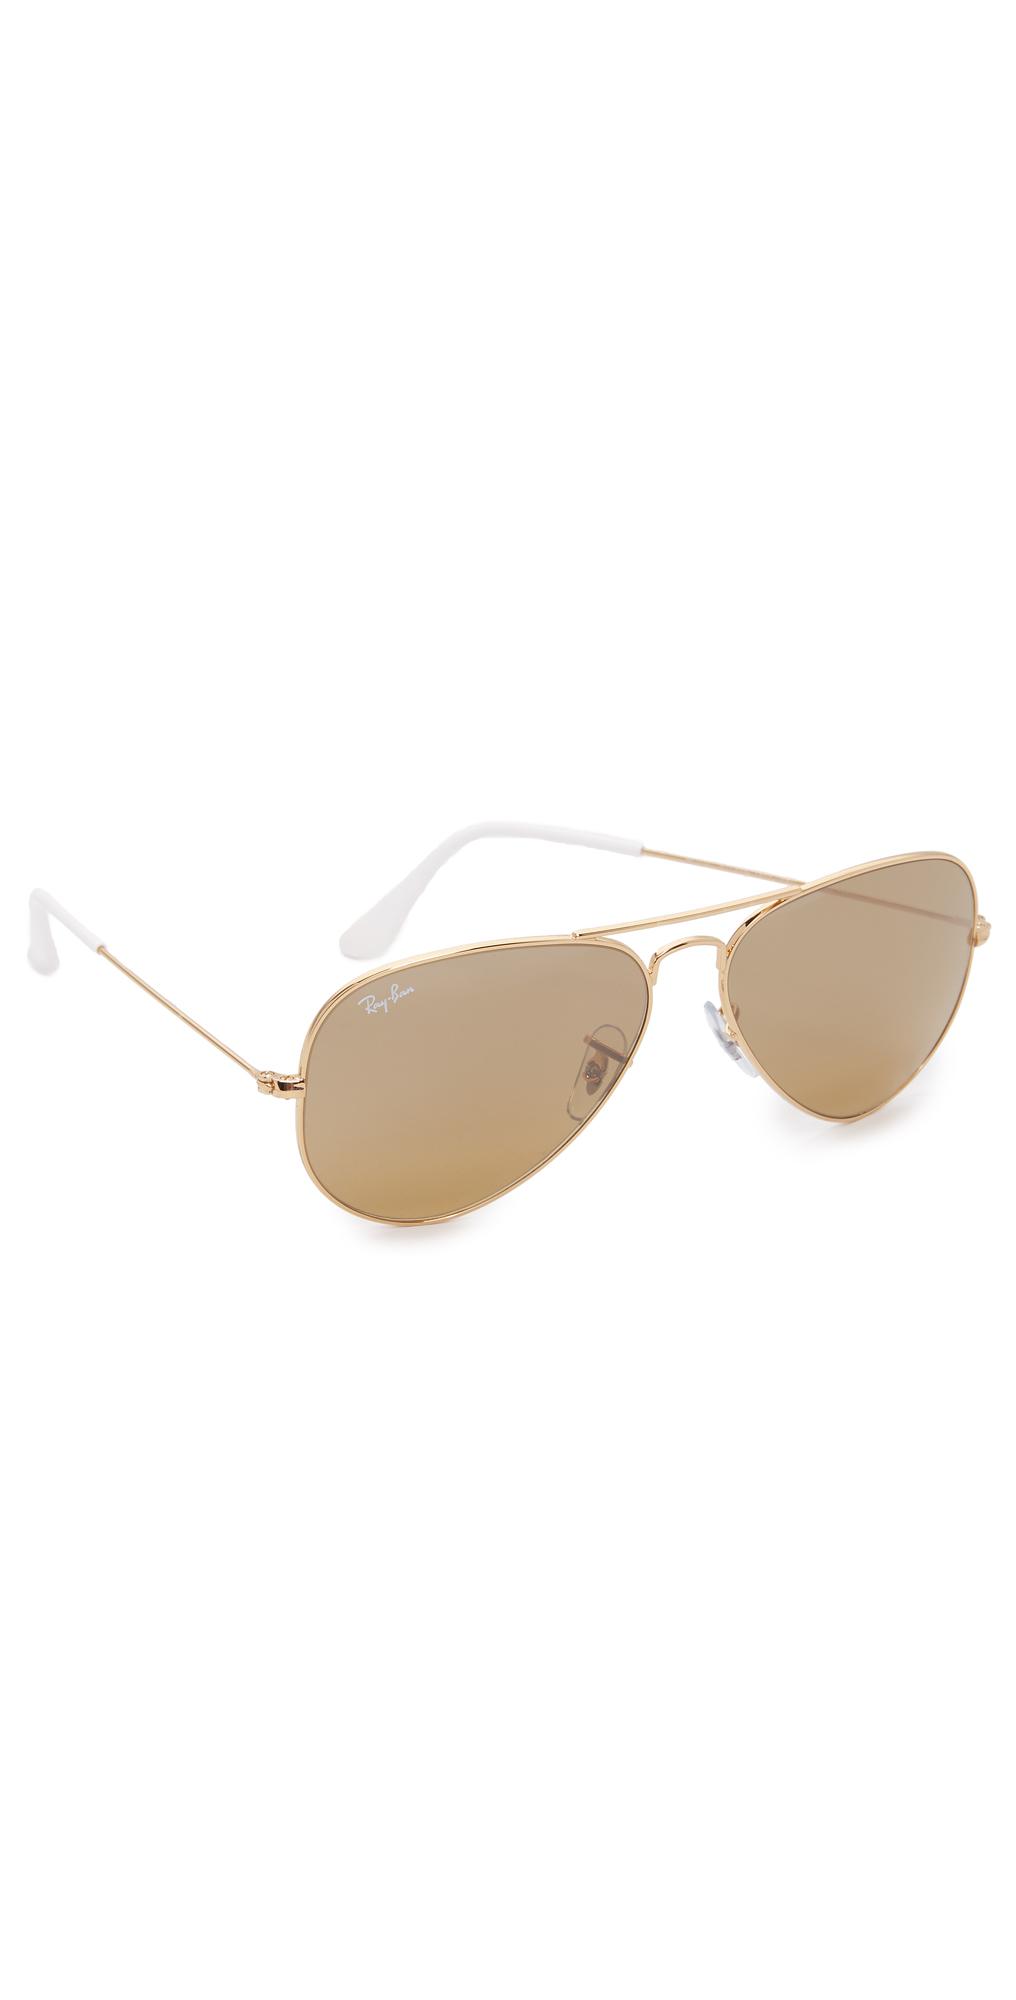 Aviator Sunglasses Ray-Ban